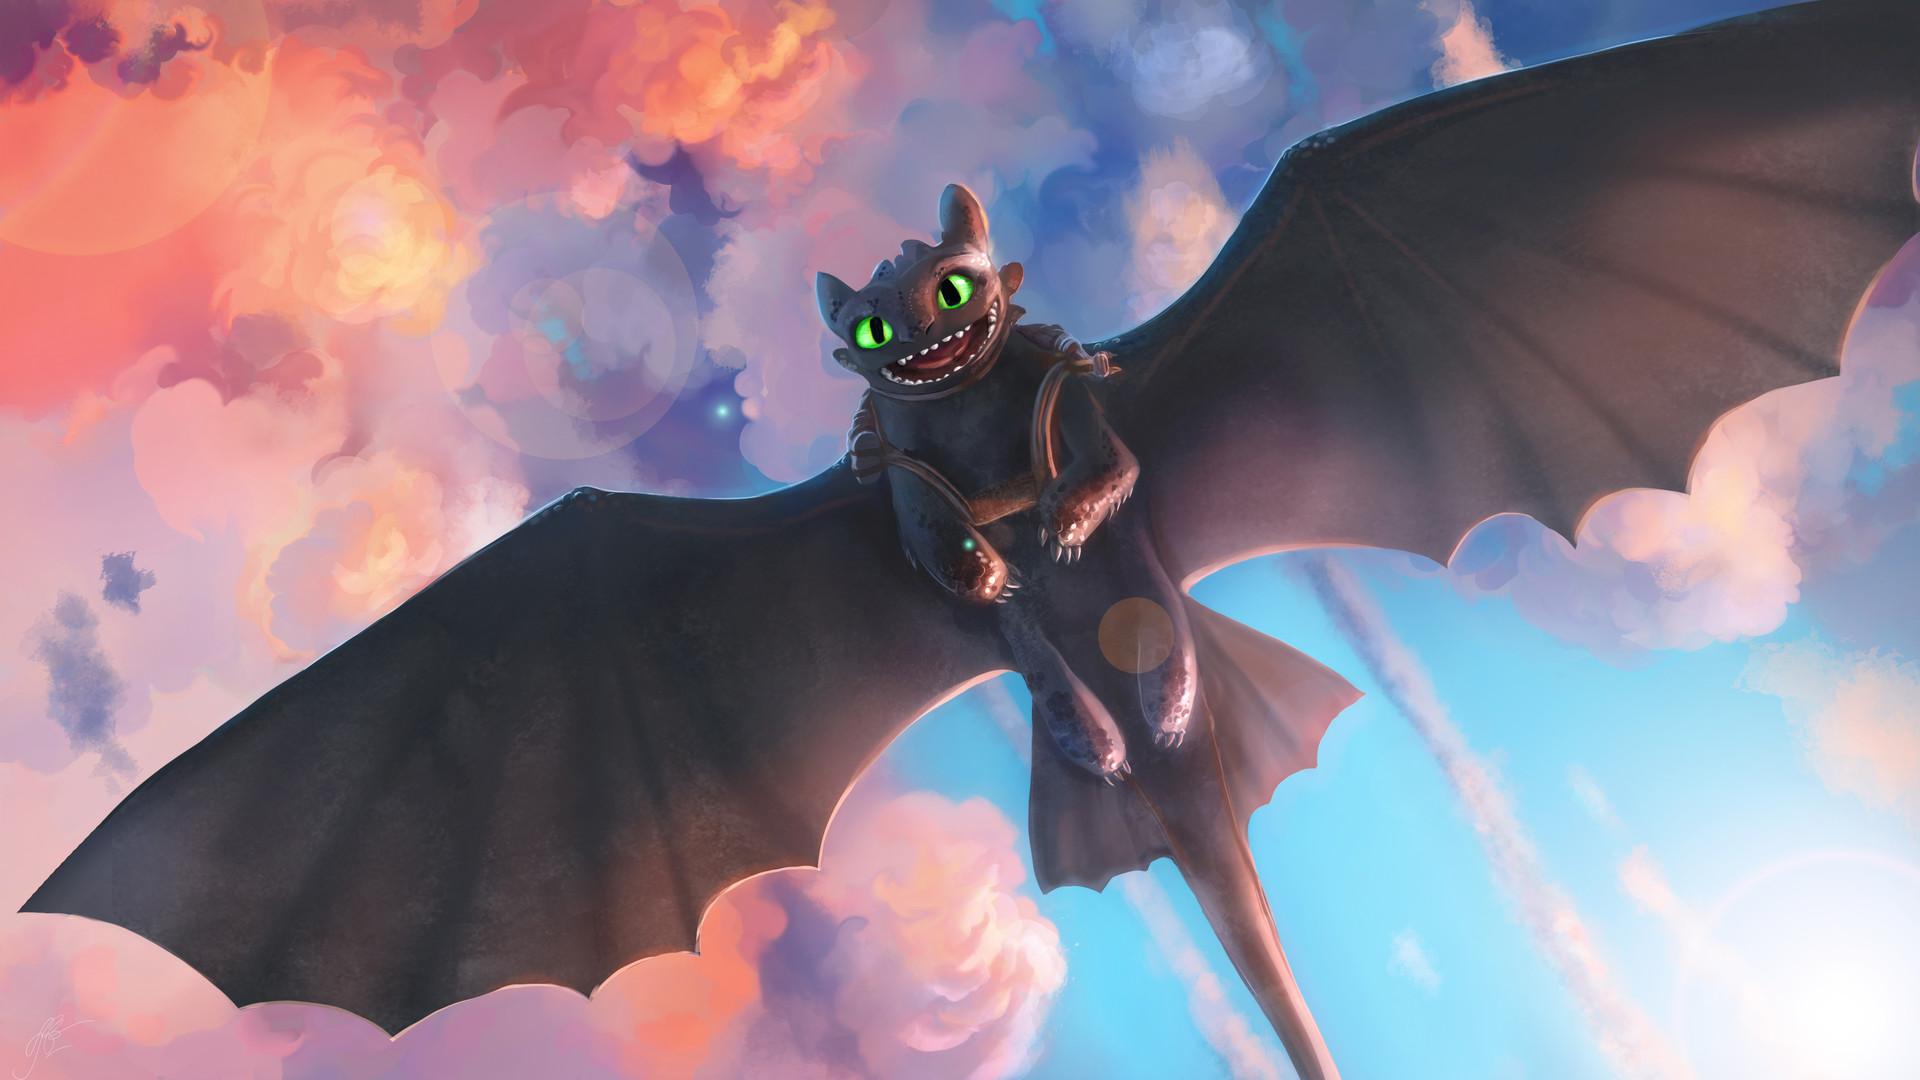 Toothless Artwork